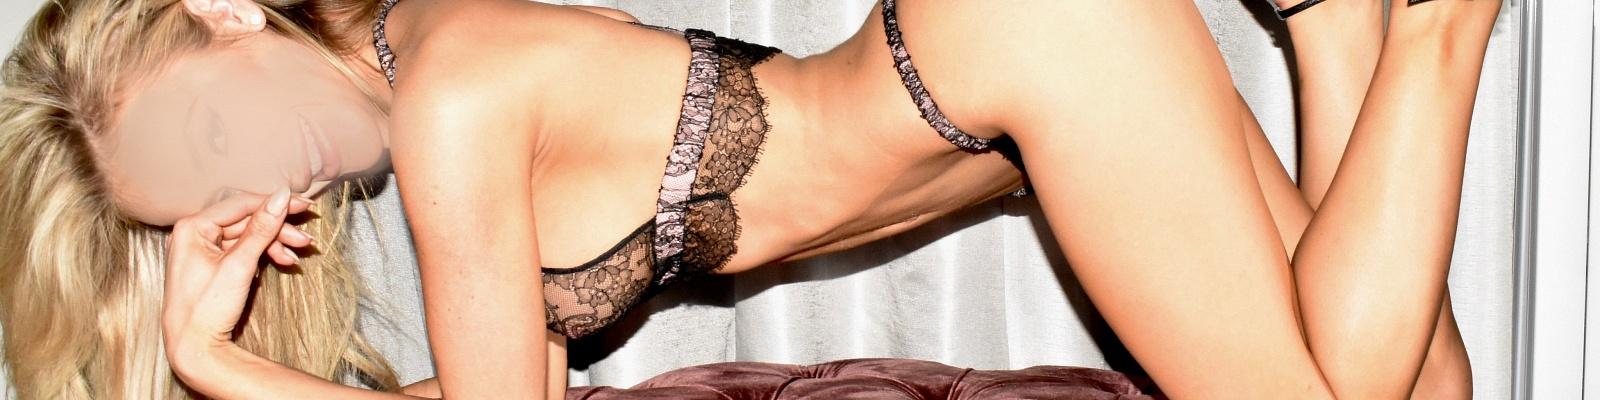 Madison Dior's Cover Photo